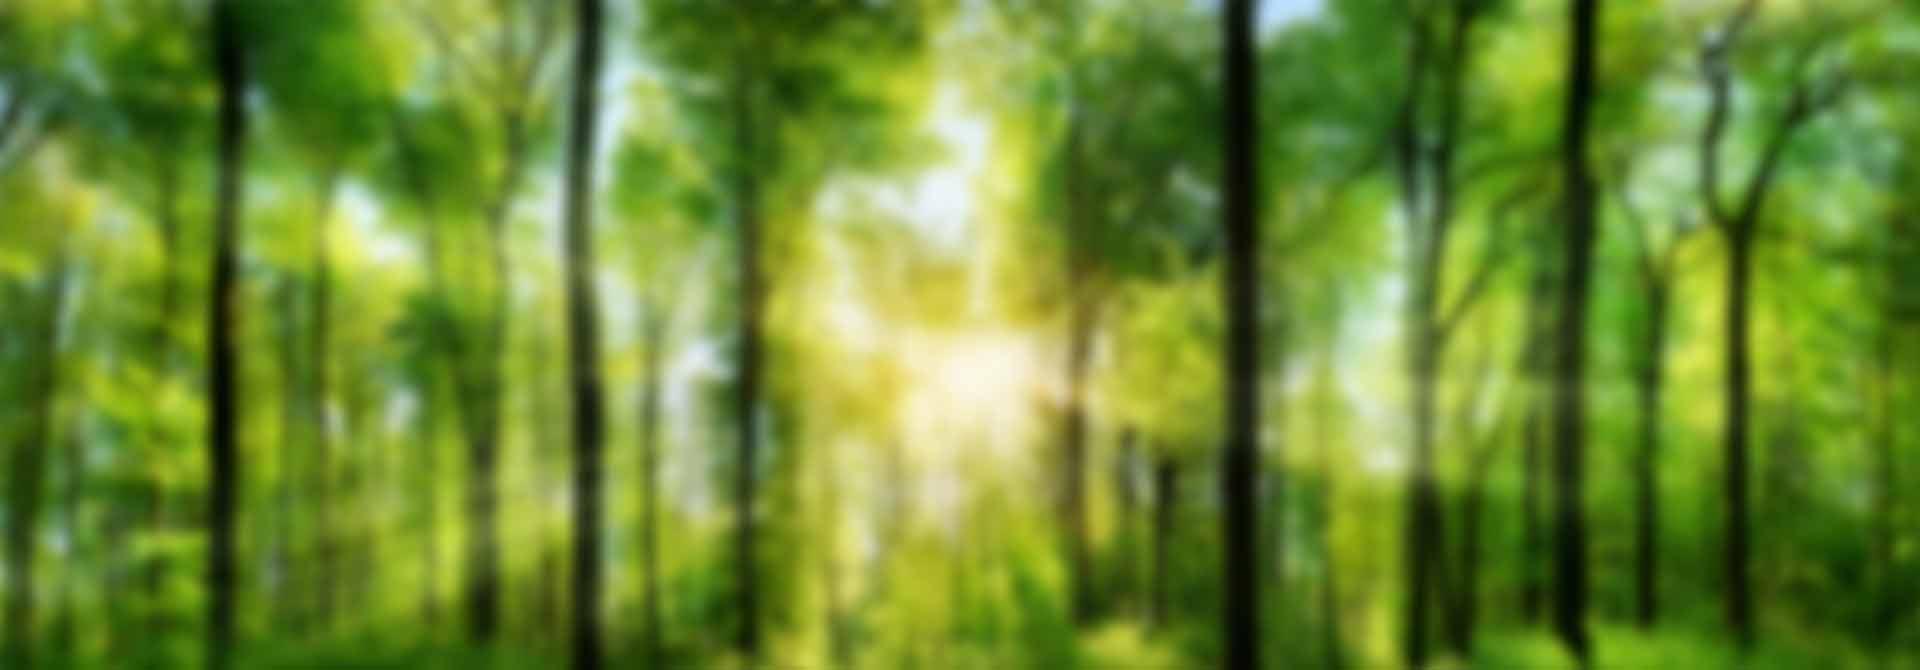 arboles-naturaleza-(1)-desef.